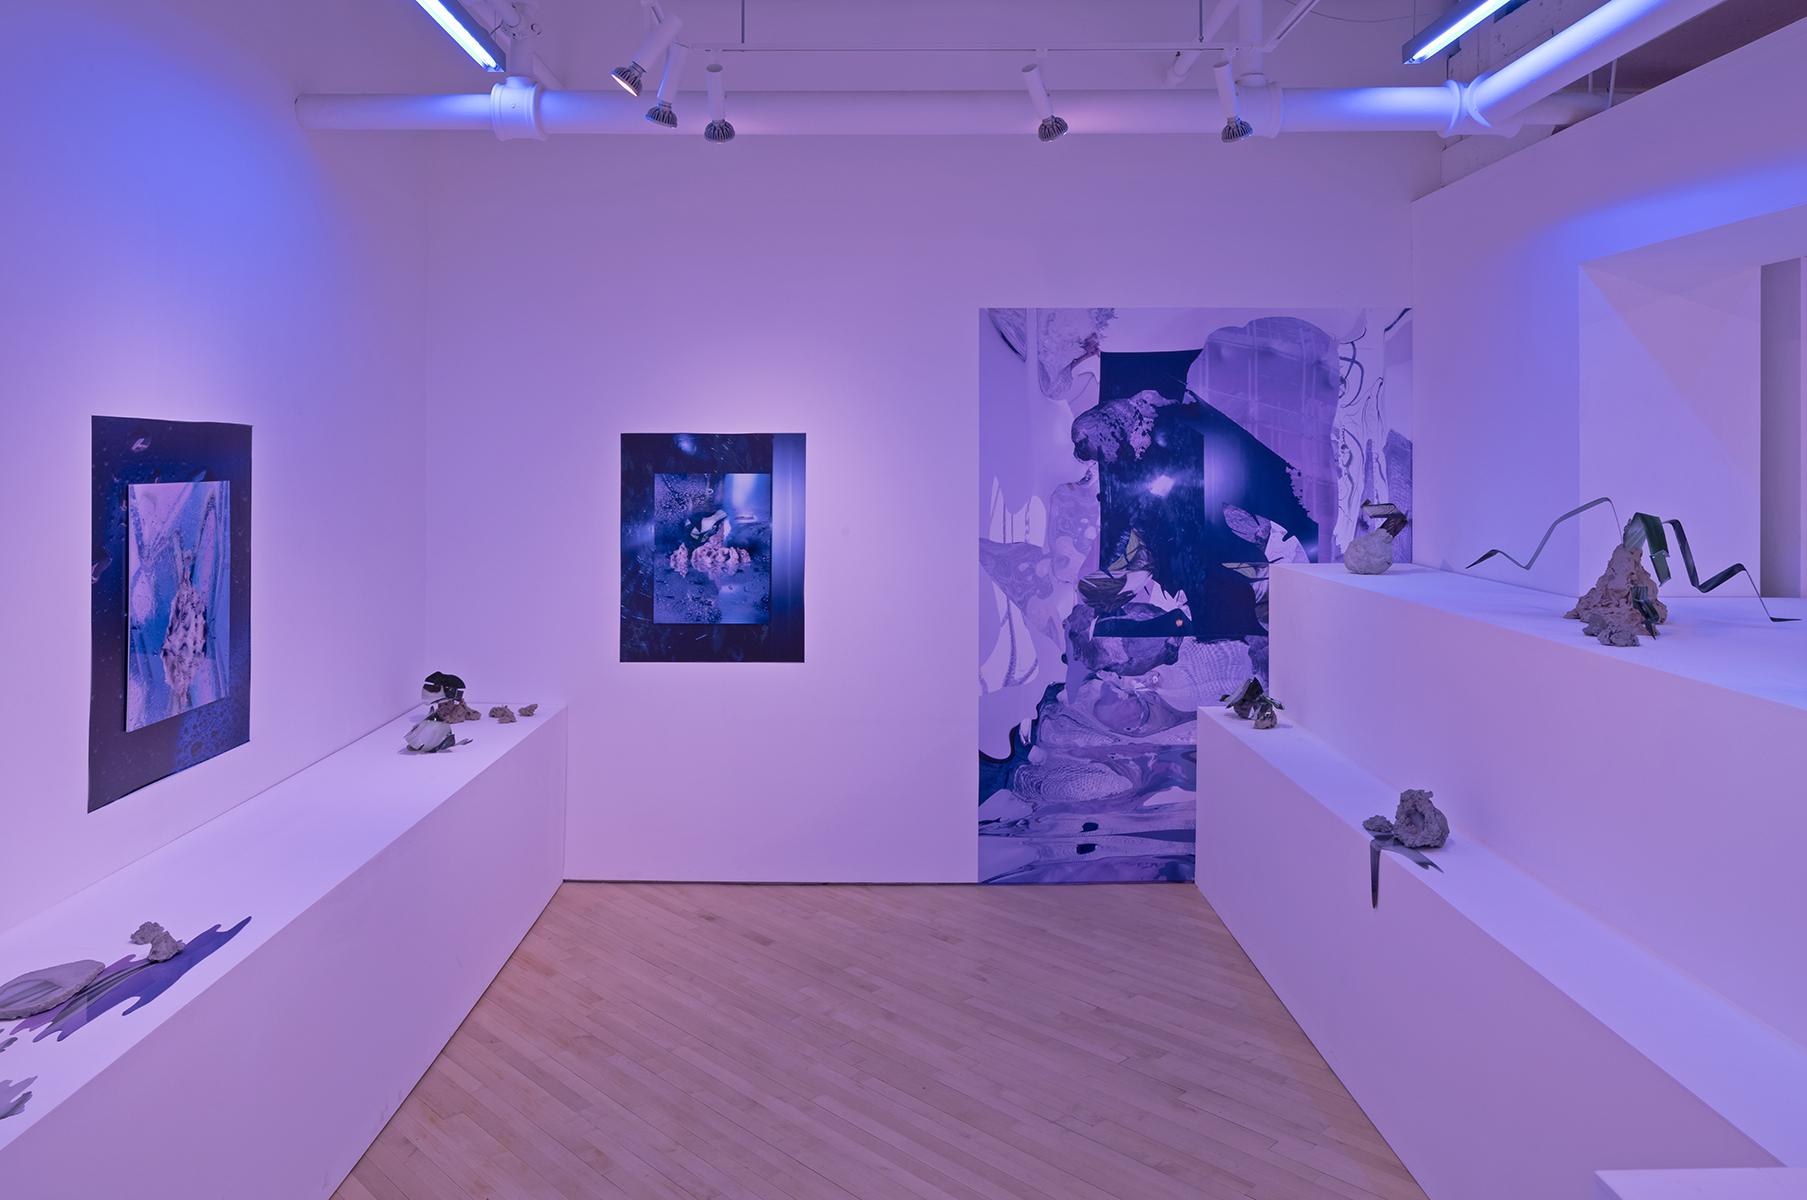 Felicity Hammond, Arcades, Exhibition at CONTACT Gallery, April - June 2018. Photo by Toni Hafkenscheid.